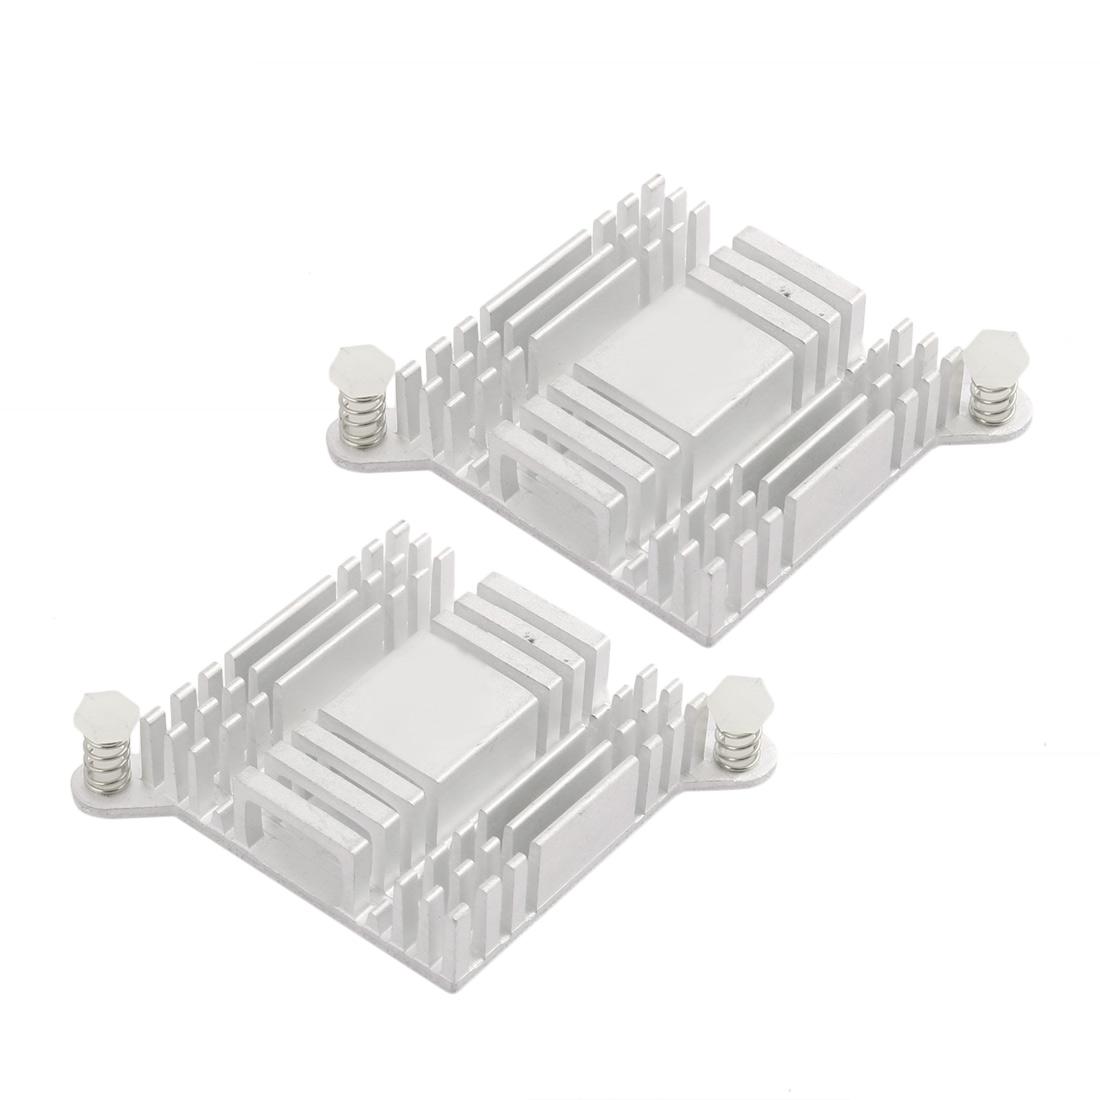 2Pcs 38mm x 38mm x 10mm Aluminum Heatsink Radiator Cooling Fin Silver Tone